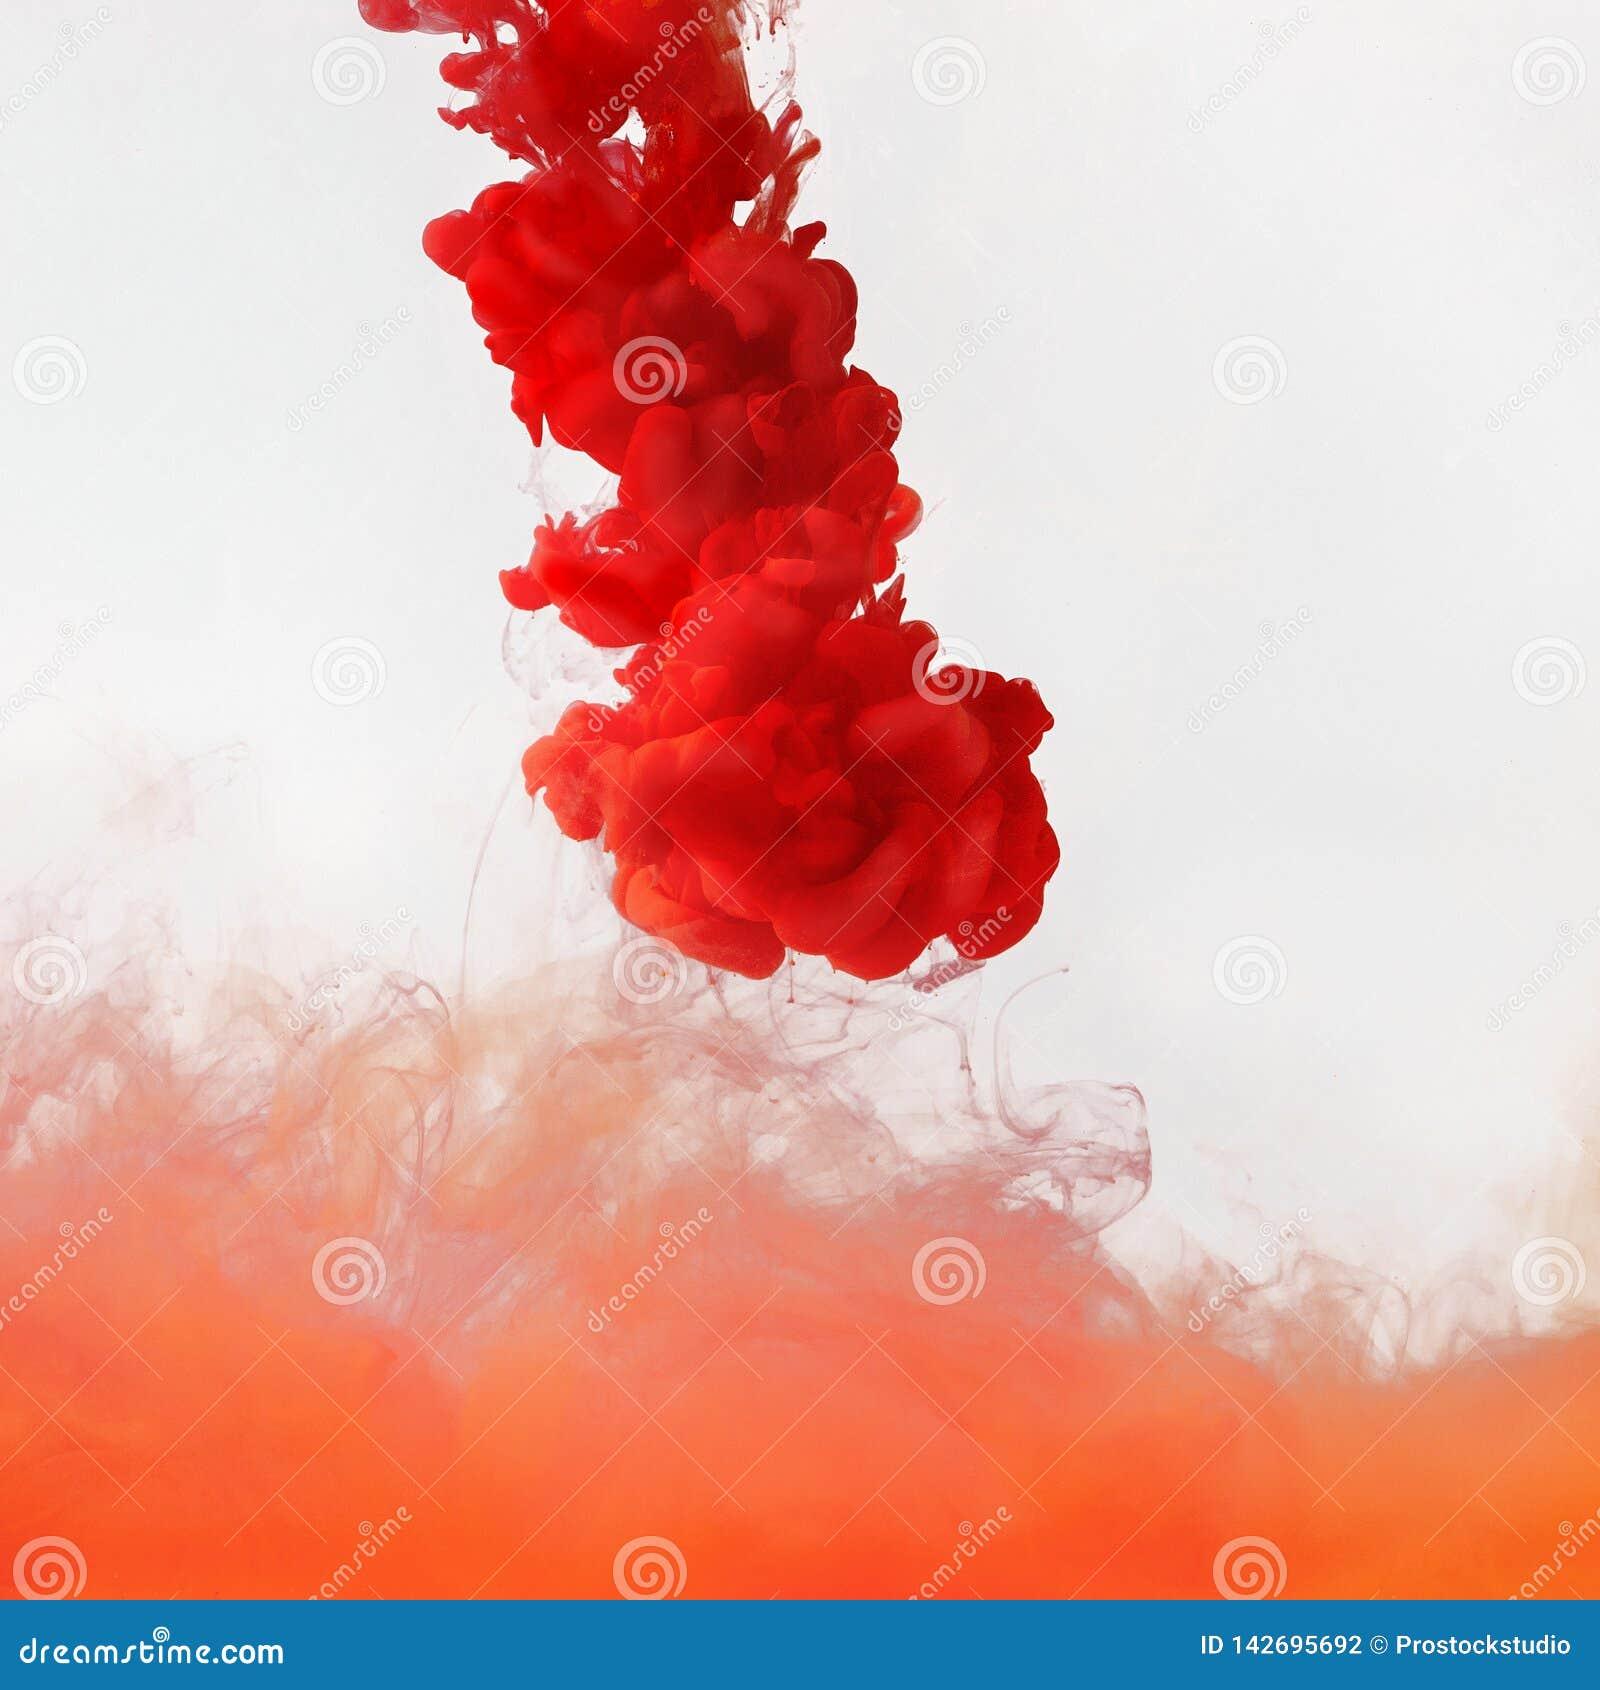 Colored smoke underwater